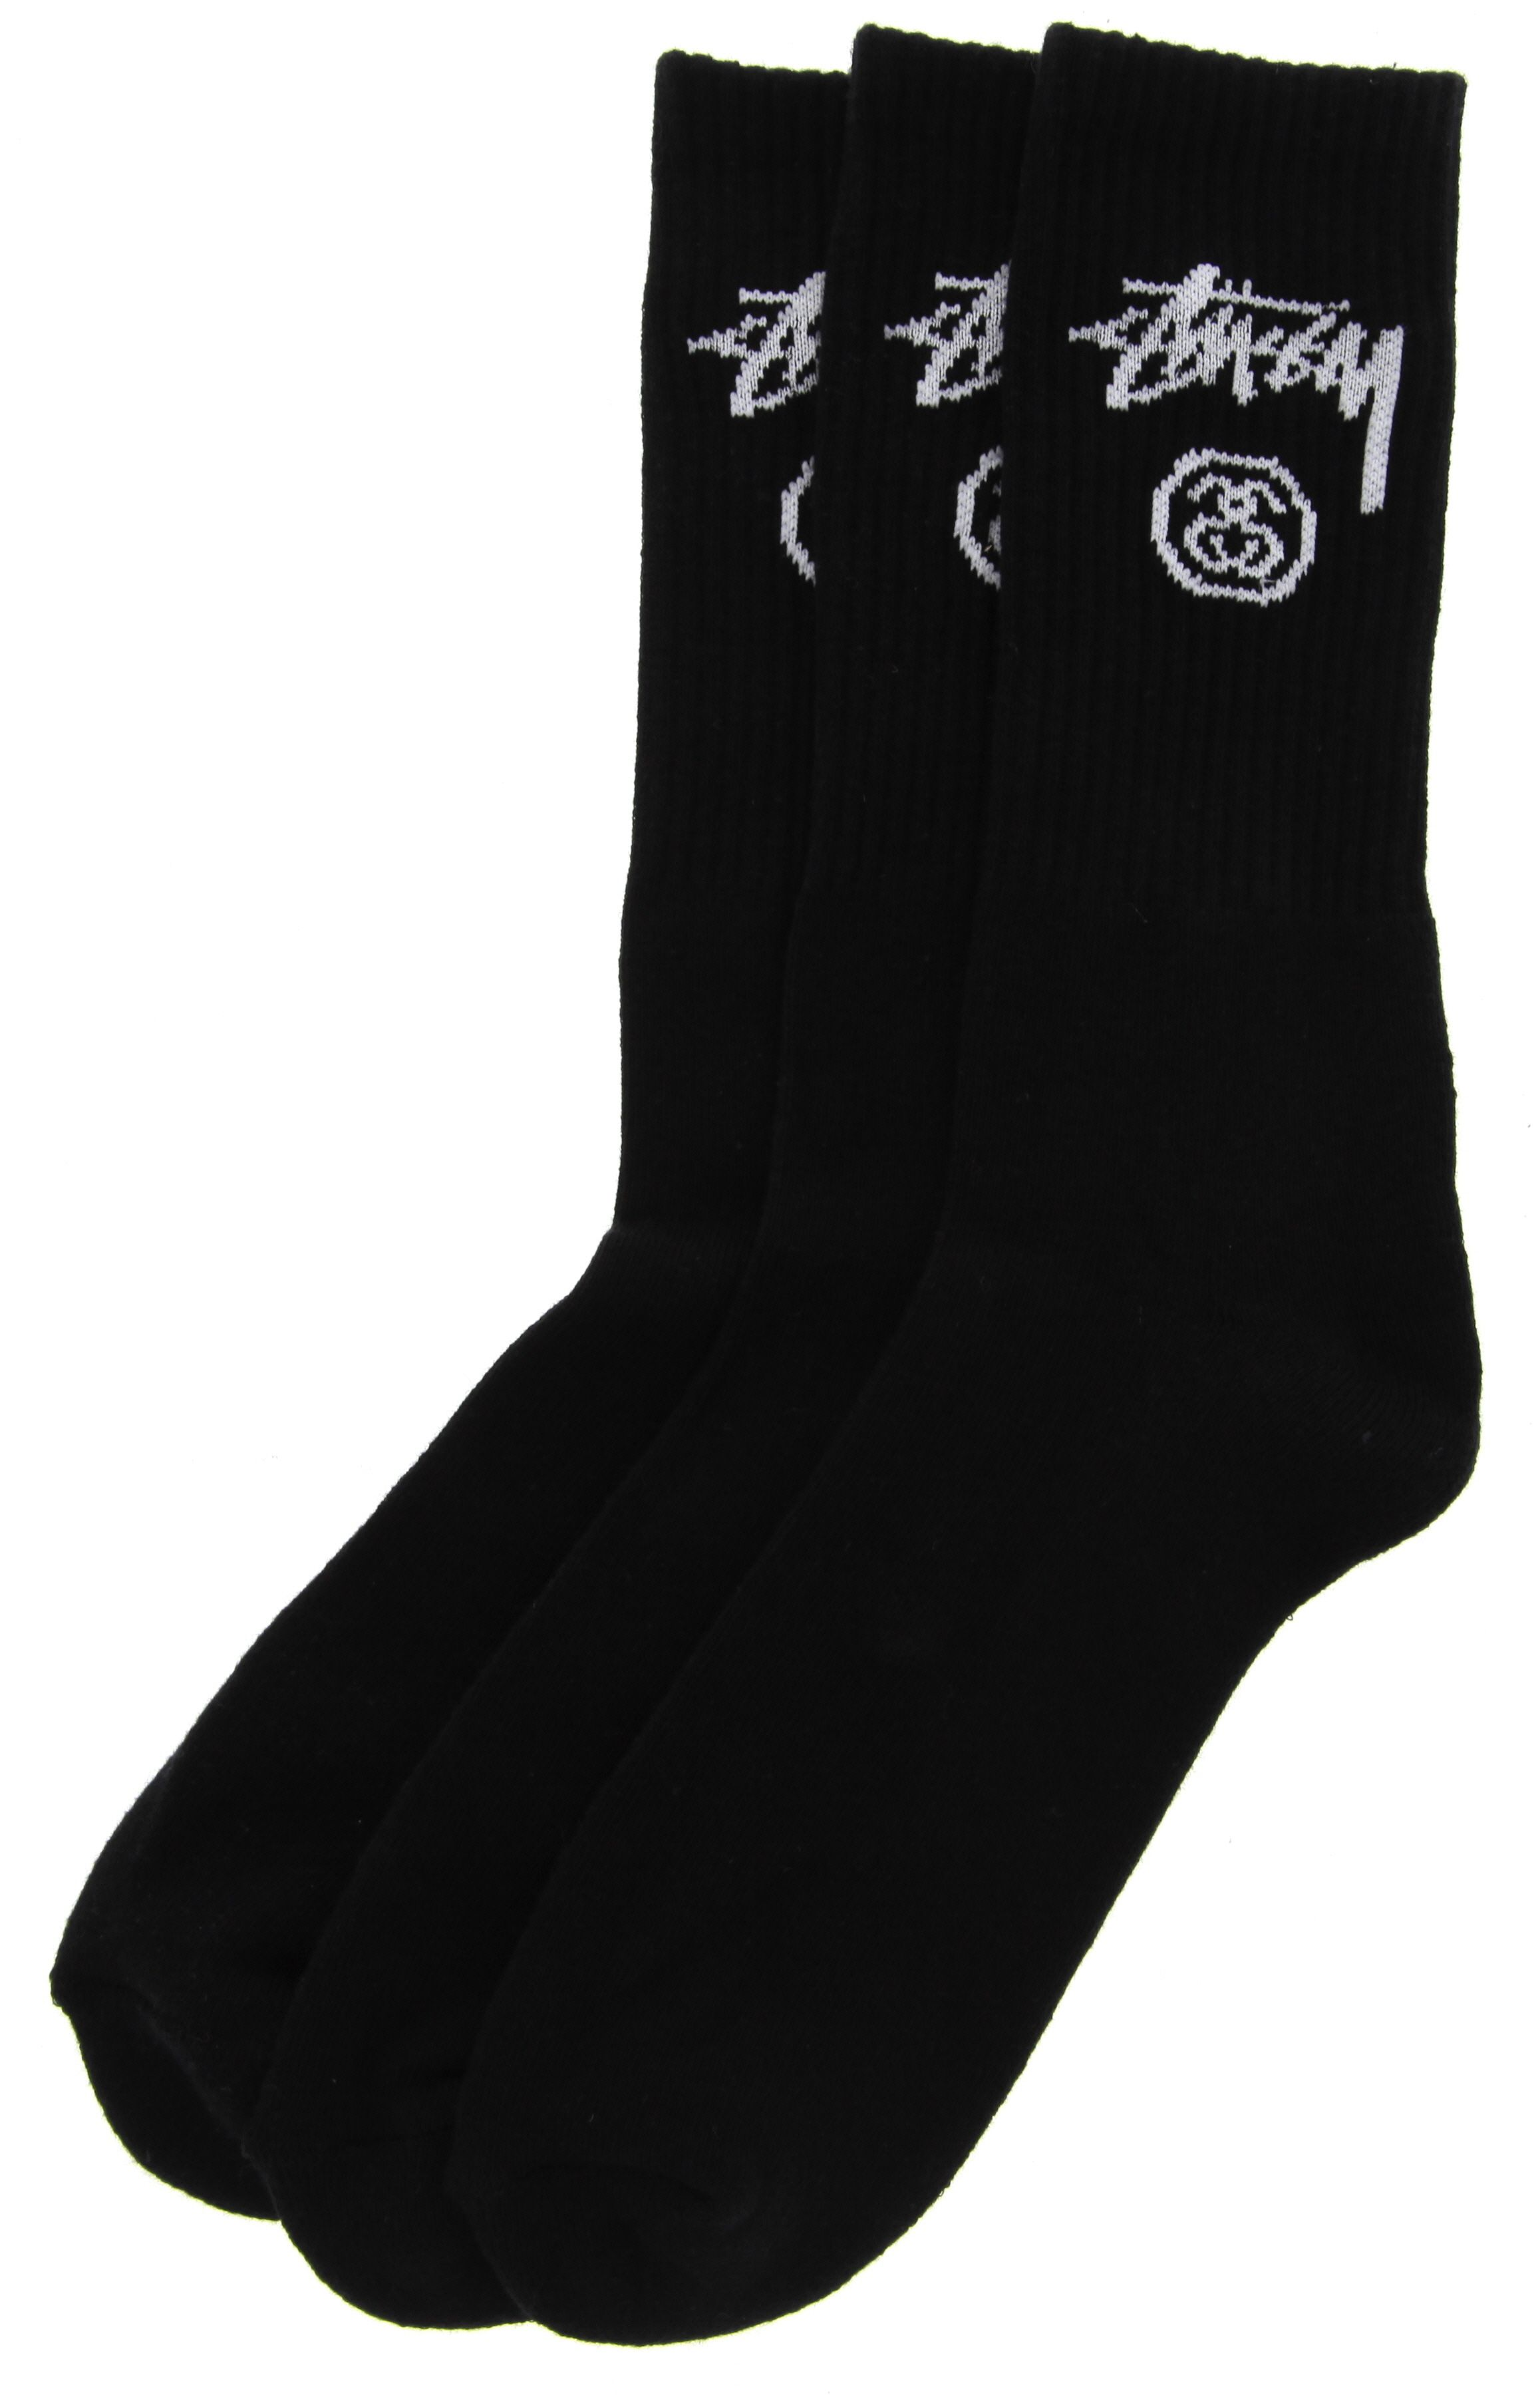 8ed1f1fa5be Stussy 3 Pack of Stock Crew Socks in Black NEW